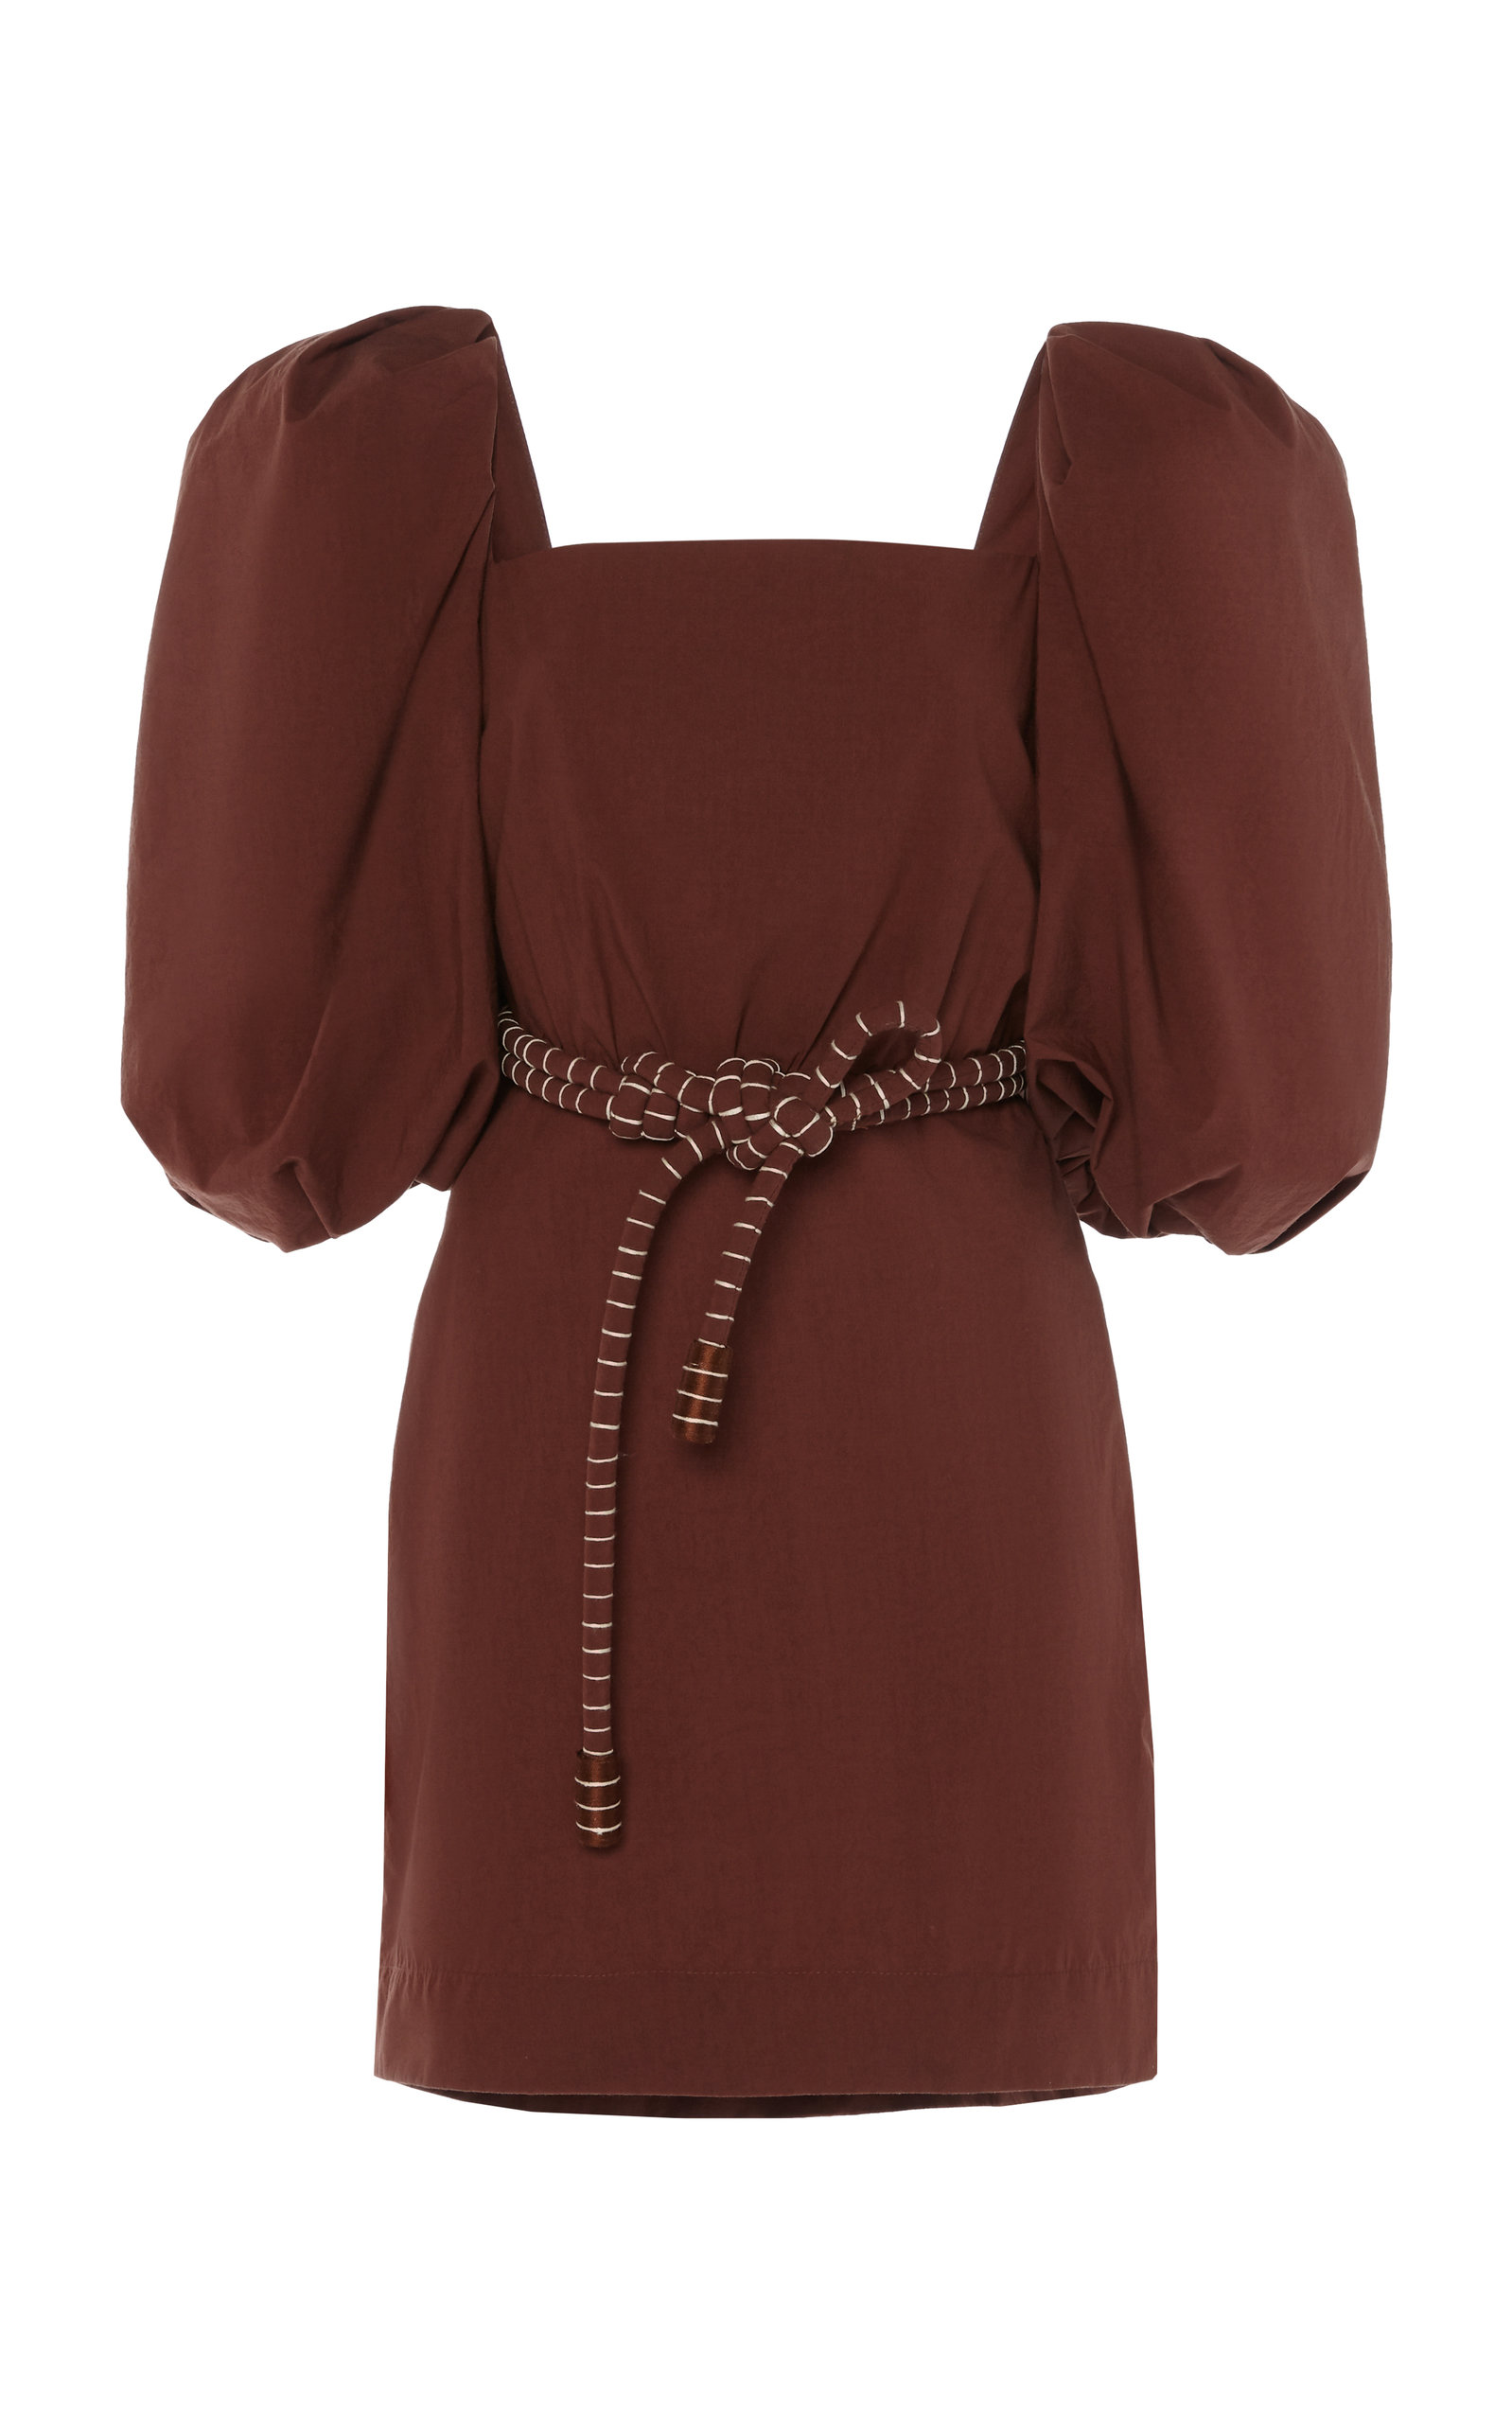 Buy Johanna Ortiz Linear Rhythm Cotton Mini Dress online, shop Johanna Ortiz at the best price